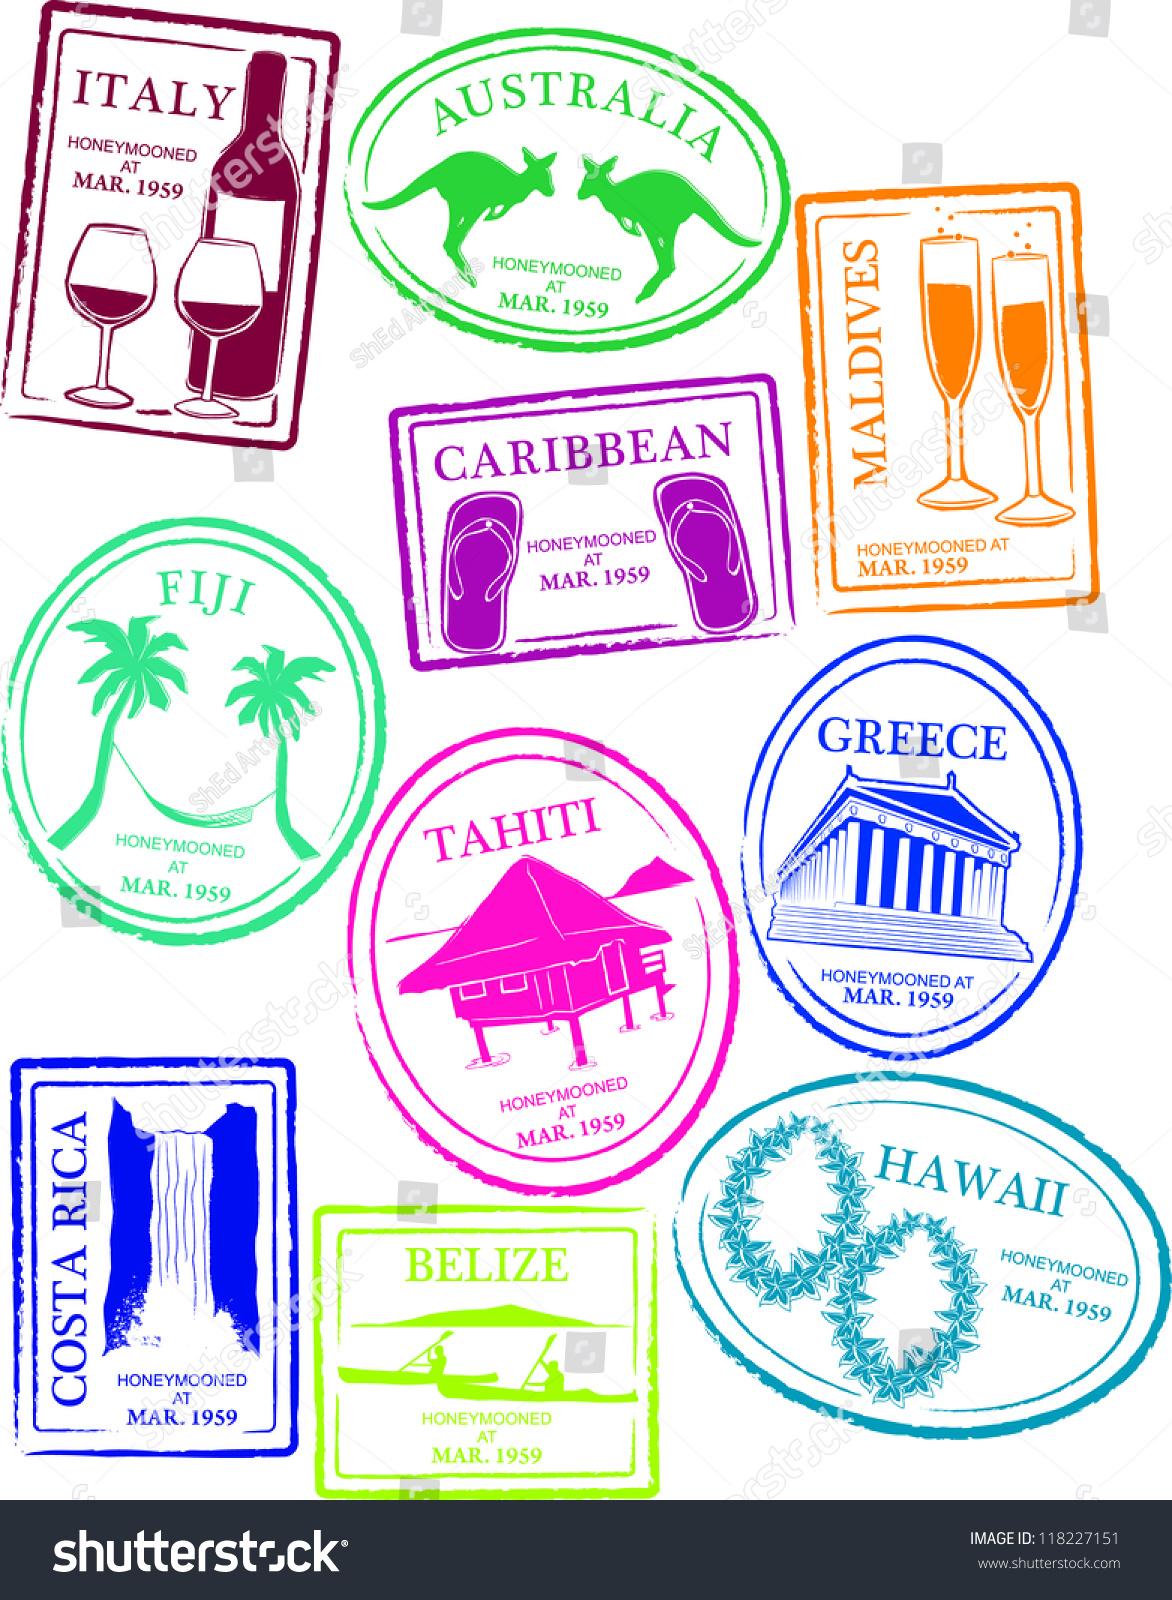 Retro Honeymoon Passport Stamps Vector Illustration Stock ...